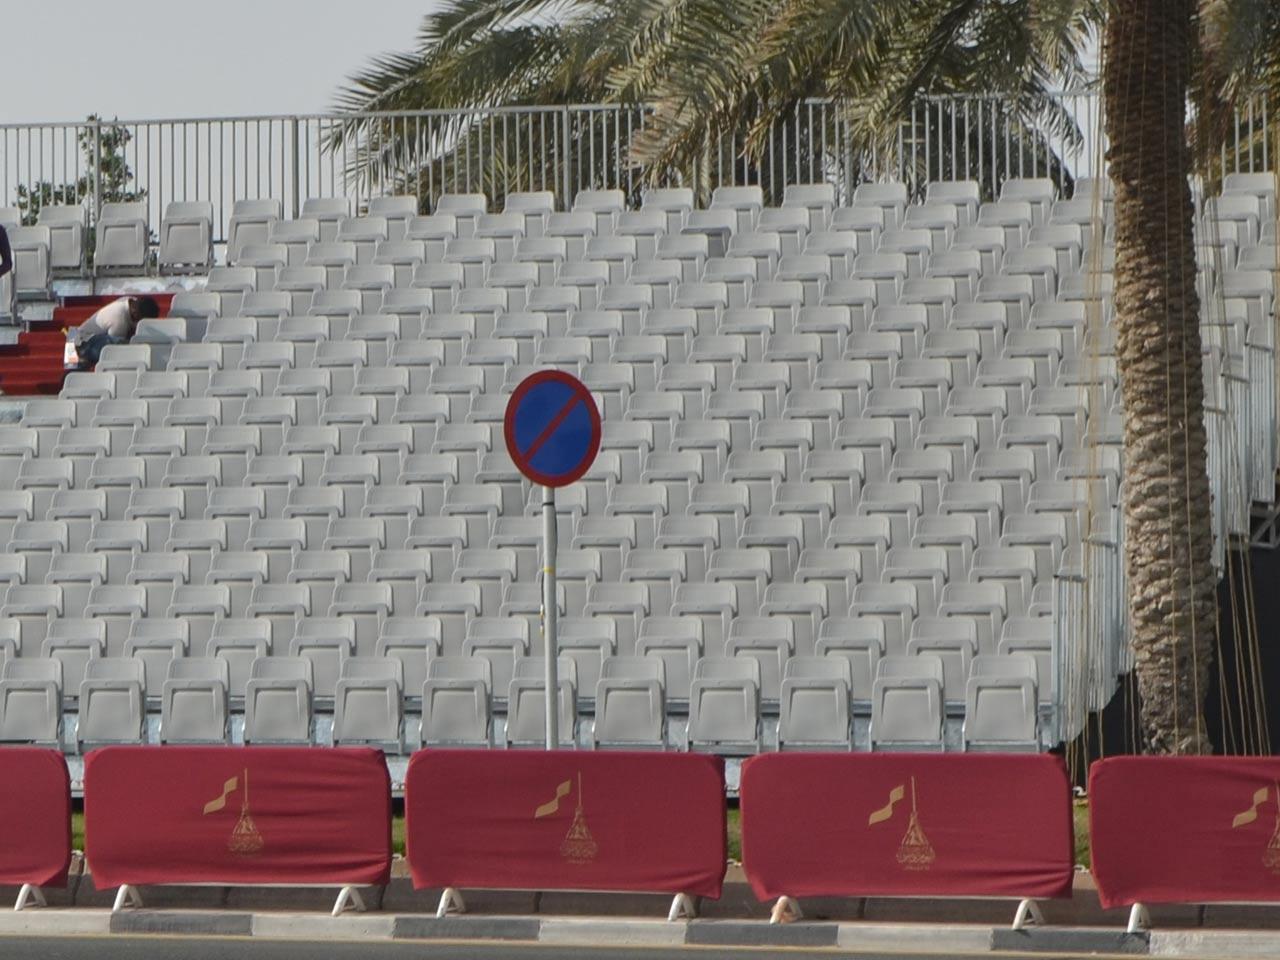 grandstand-seats-events-setup-rental-stadium-seating-sport-management-film-festival-seating-screening-f1-open-air-cinema-4